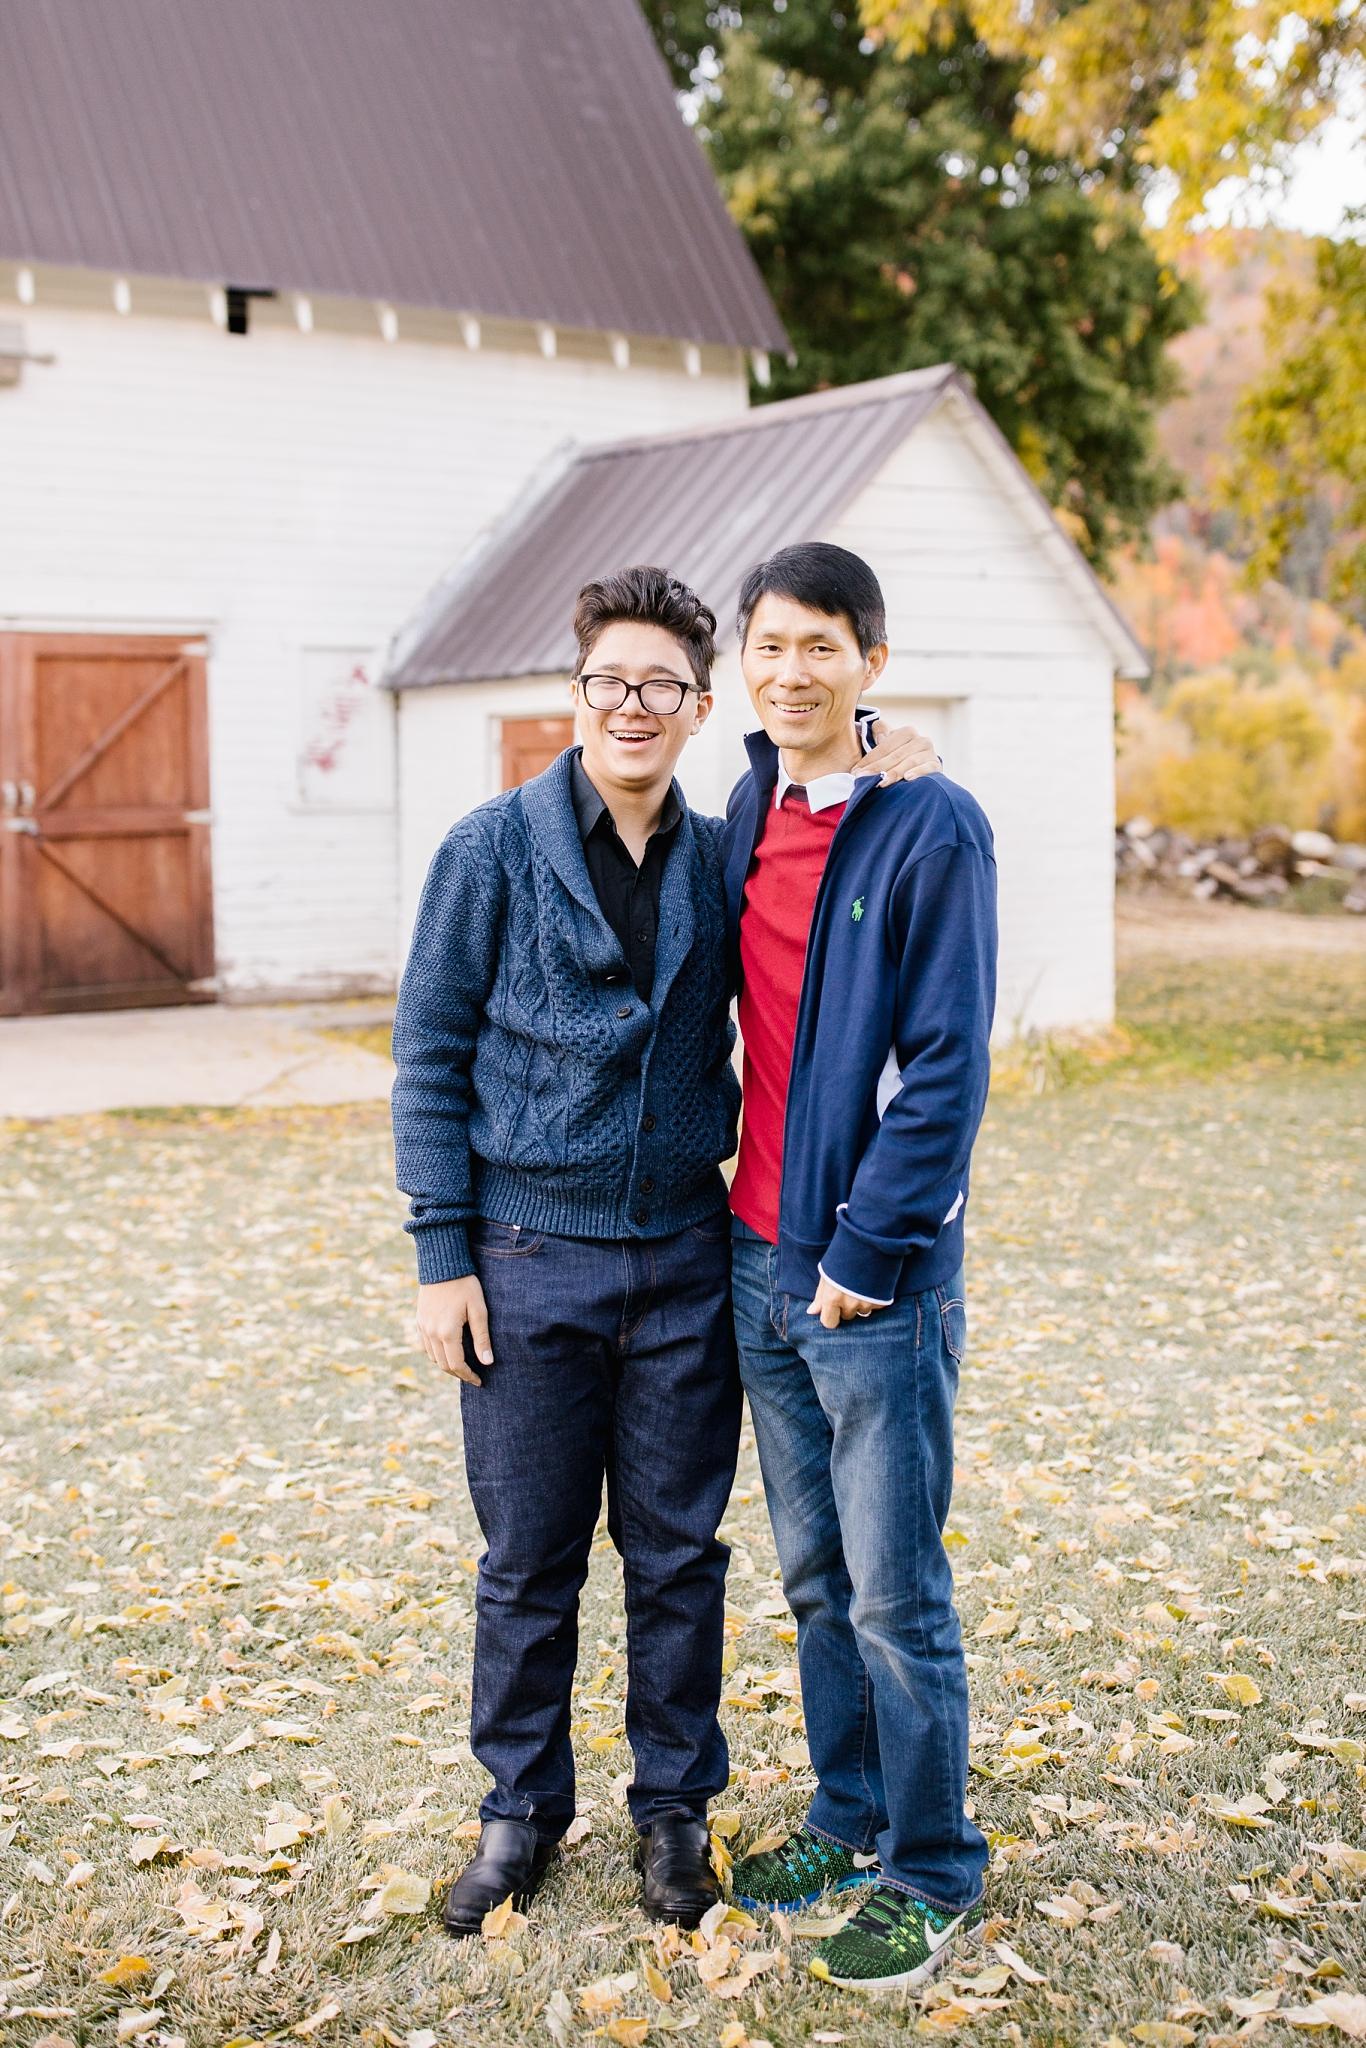 Qian-16_Lizzie-B-Imagery-Utah-Family-Photographer-Lifestyle-Photography-Salt-Lake-City-Park-City-Utah-County-Jolleys-Ranch-Hobble-Creek-Canyon-Springville-Utah.jpg